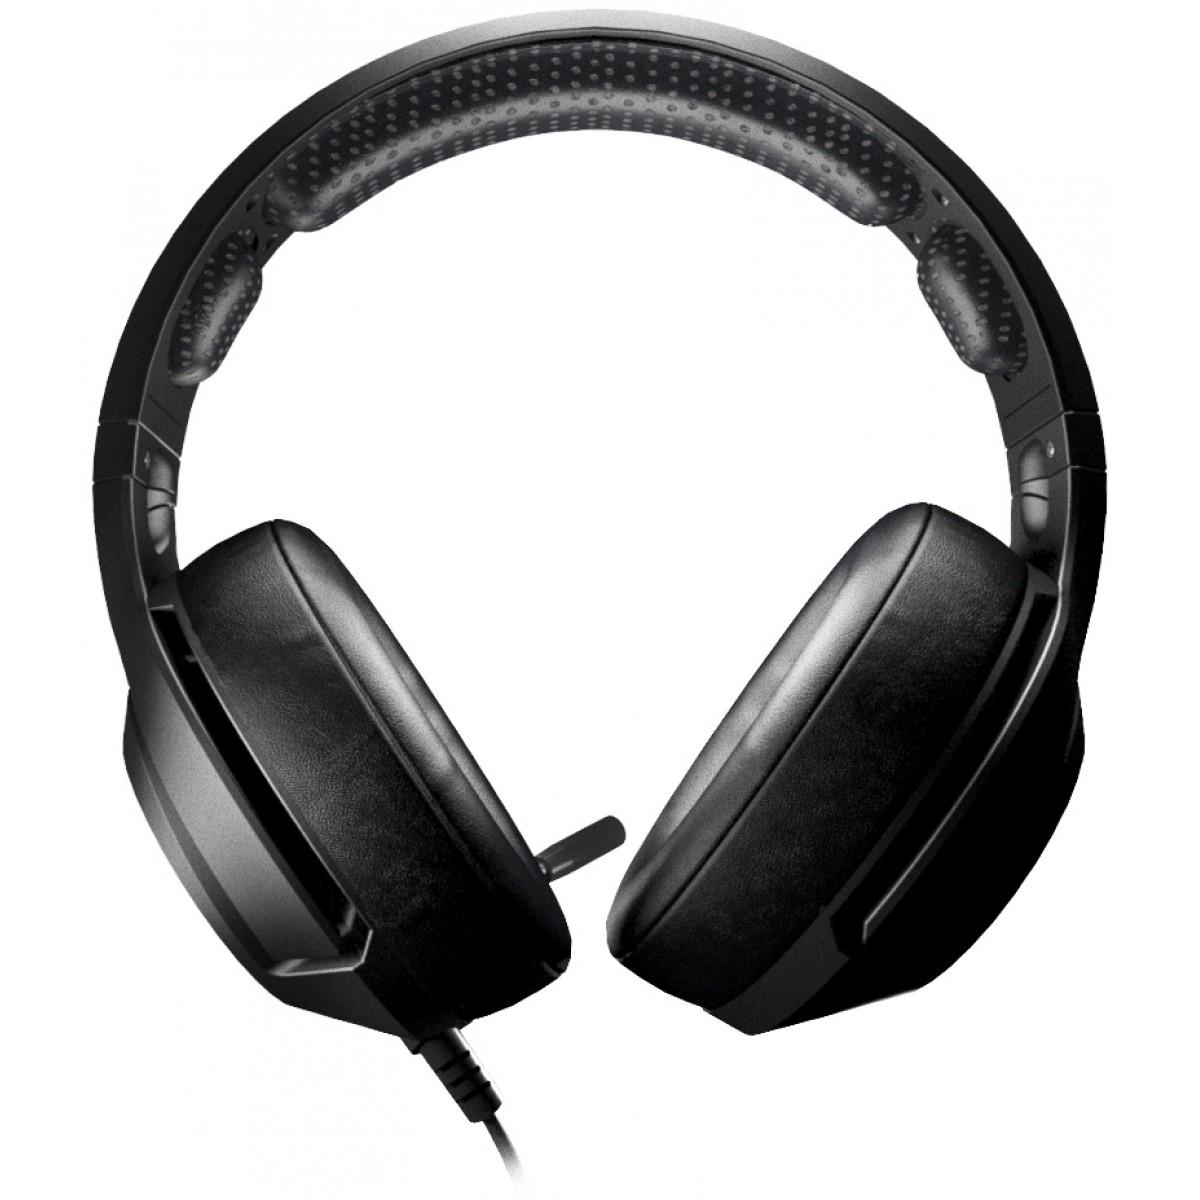 Headset Gamer Hoopson Archer 7.1, USB, Vermelho, LF80R